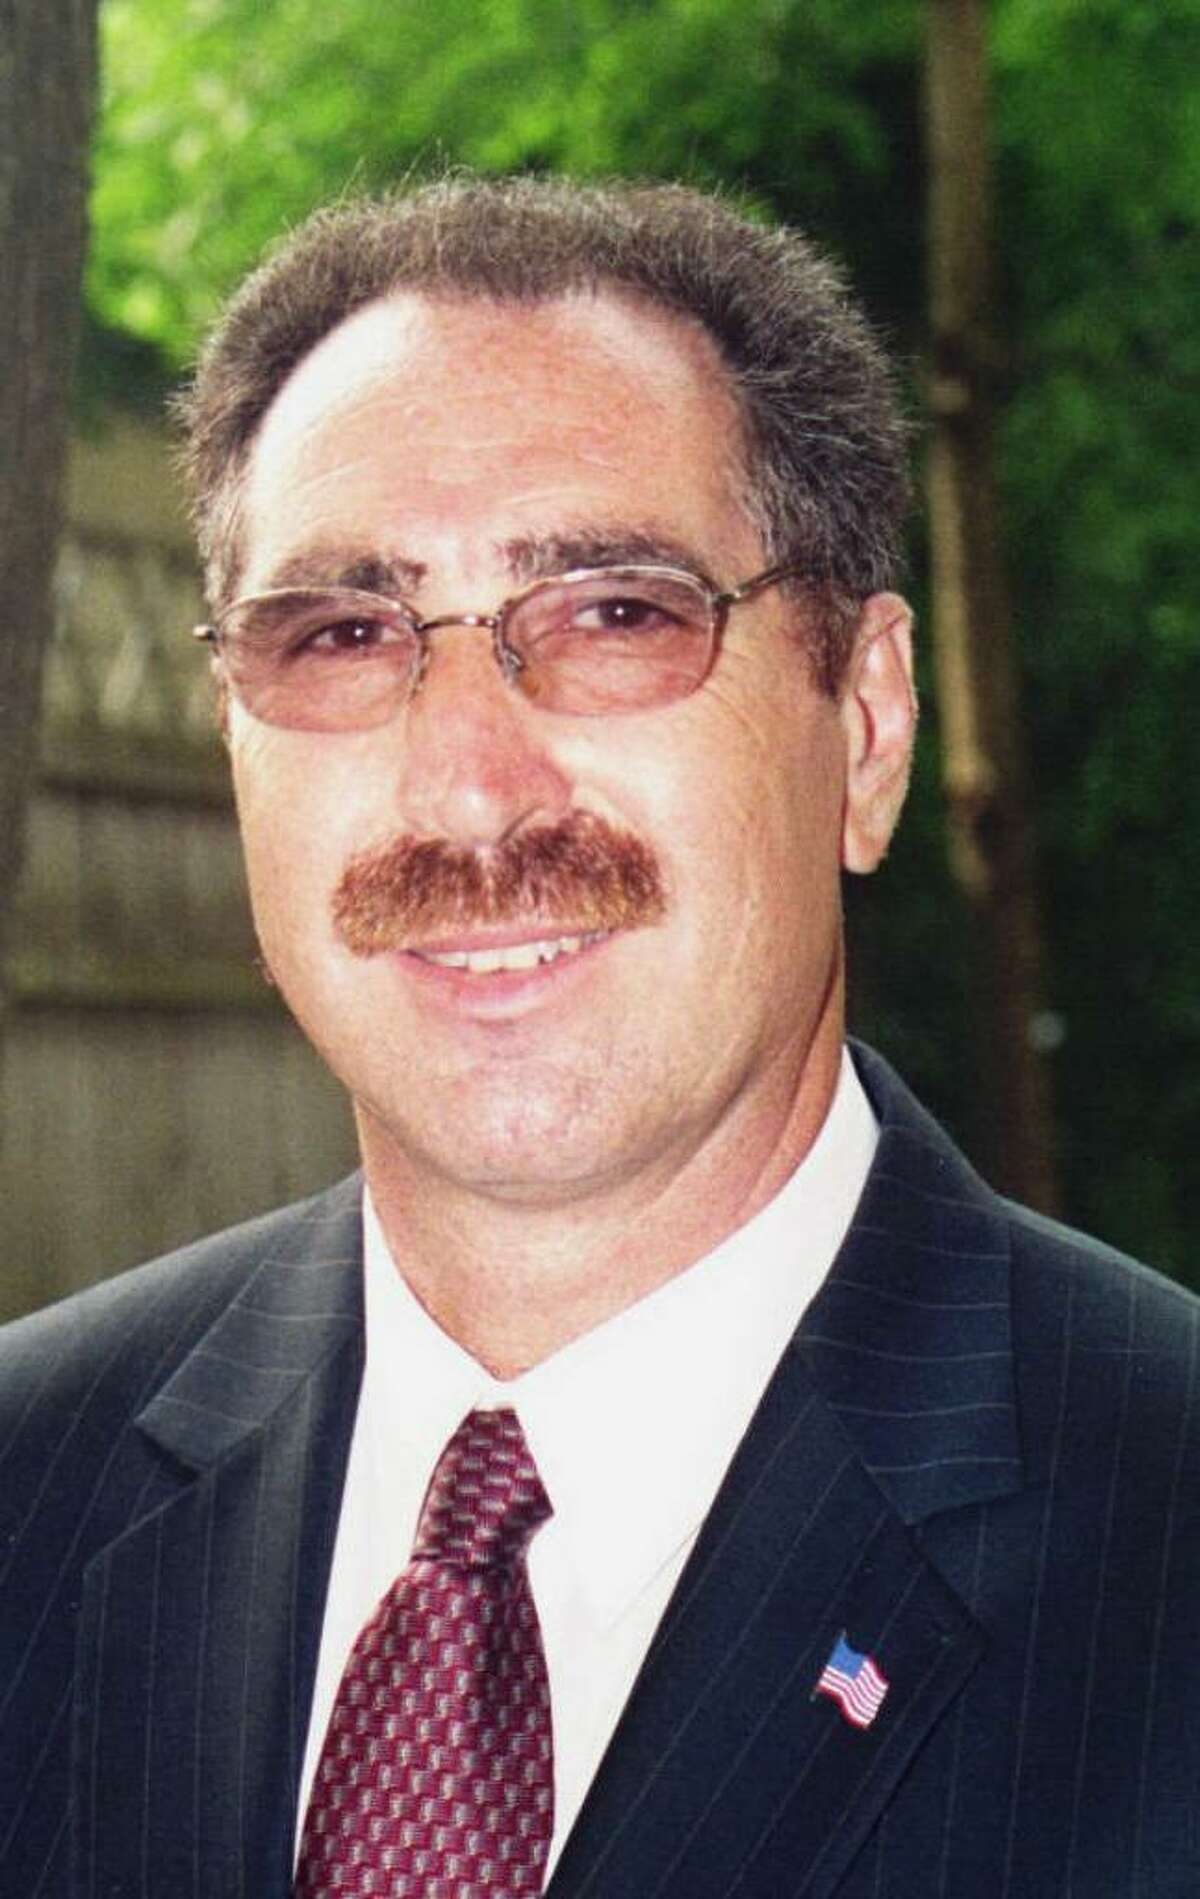 Michael LoPorto, Troy City councilman